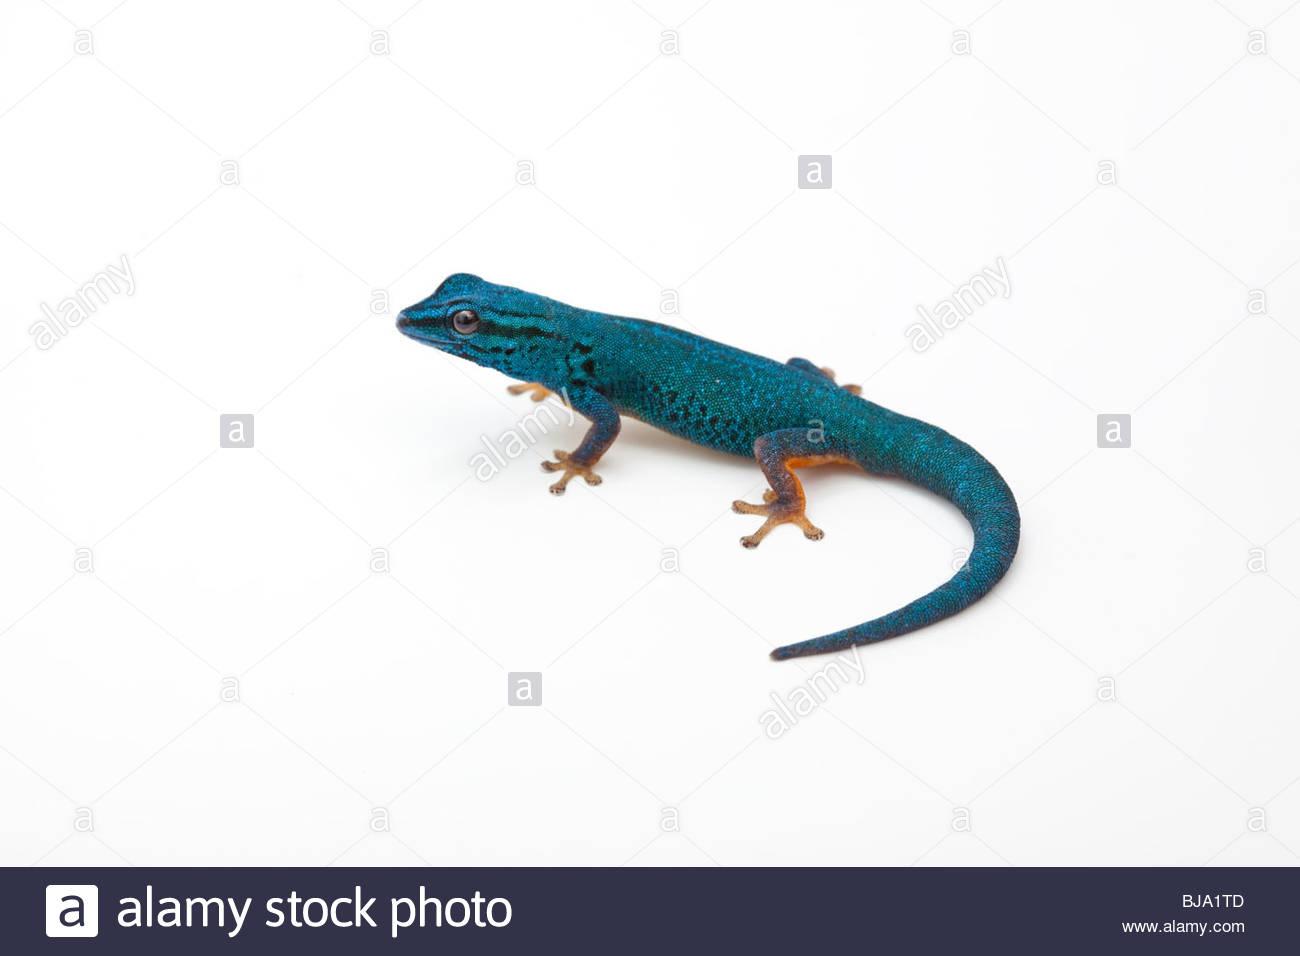 Electric Blue Gecko Stock Photos & Electric Blue Gecko Stock.